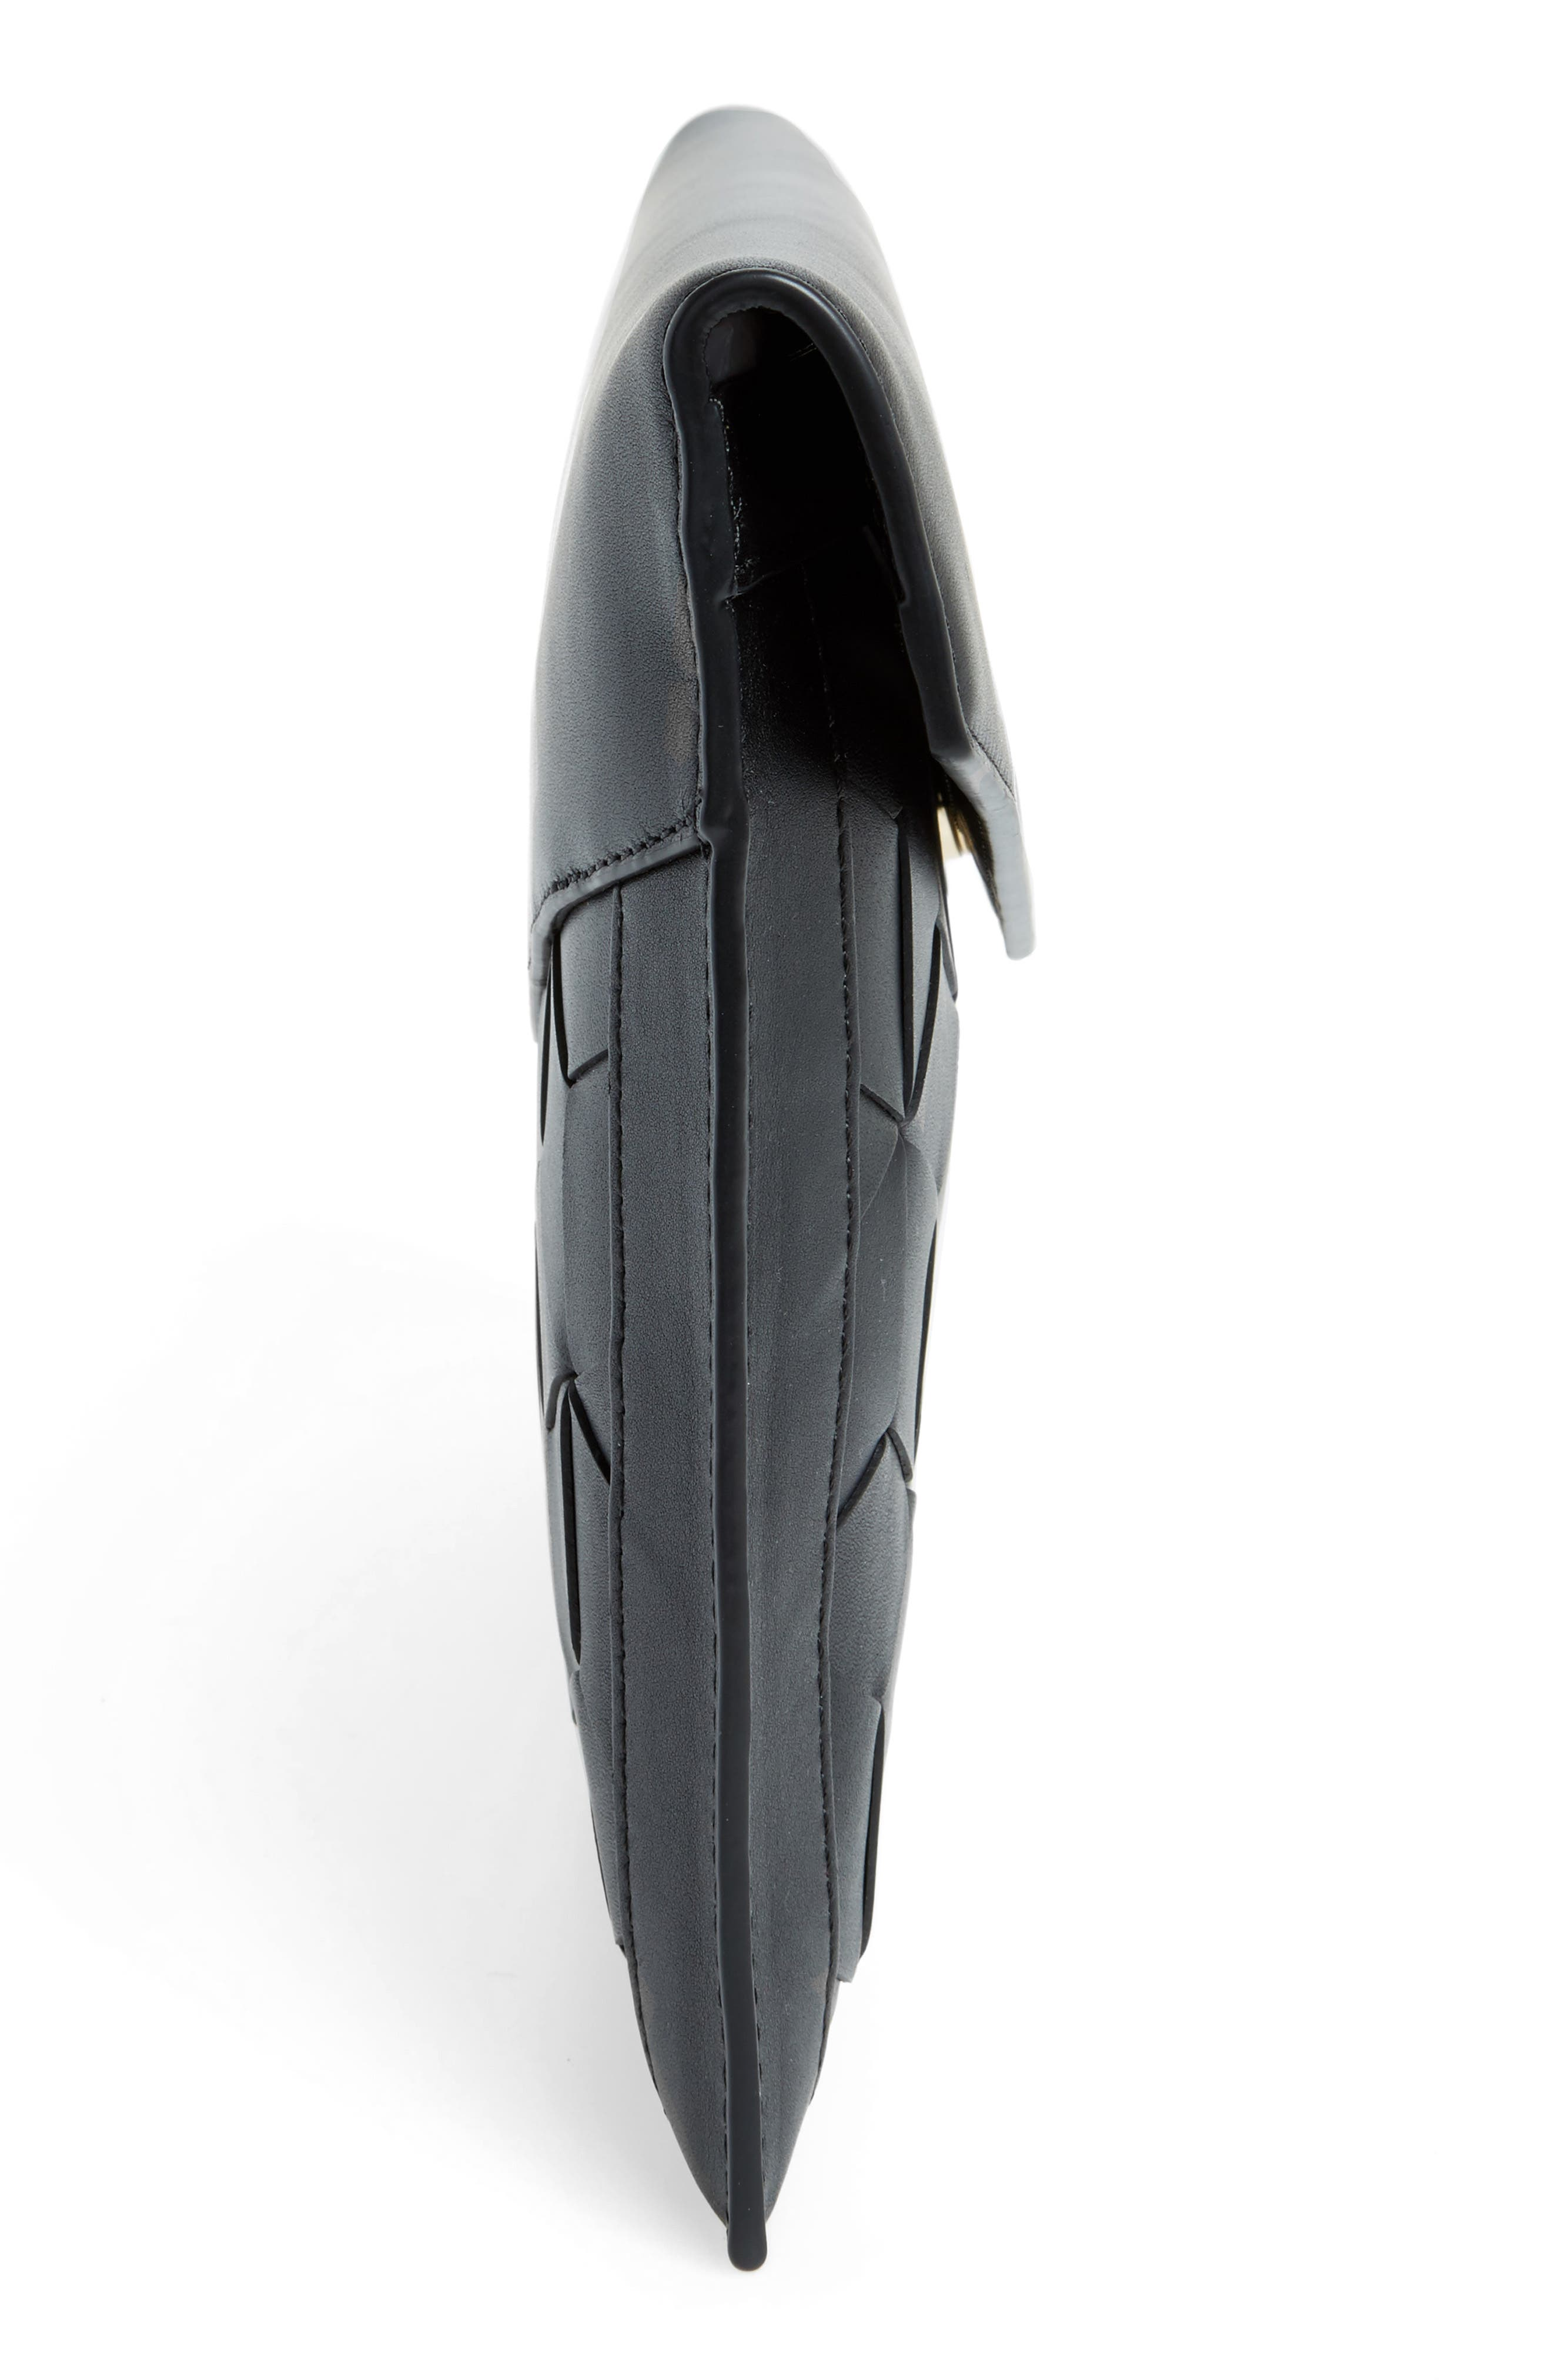 Mingle Woven Calfskin Leather Clutch,                             Alternate thumbnail 5, color,                             BLACK